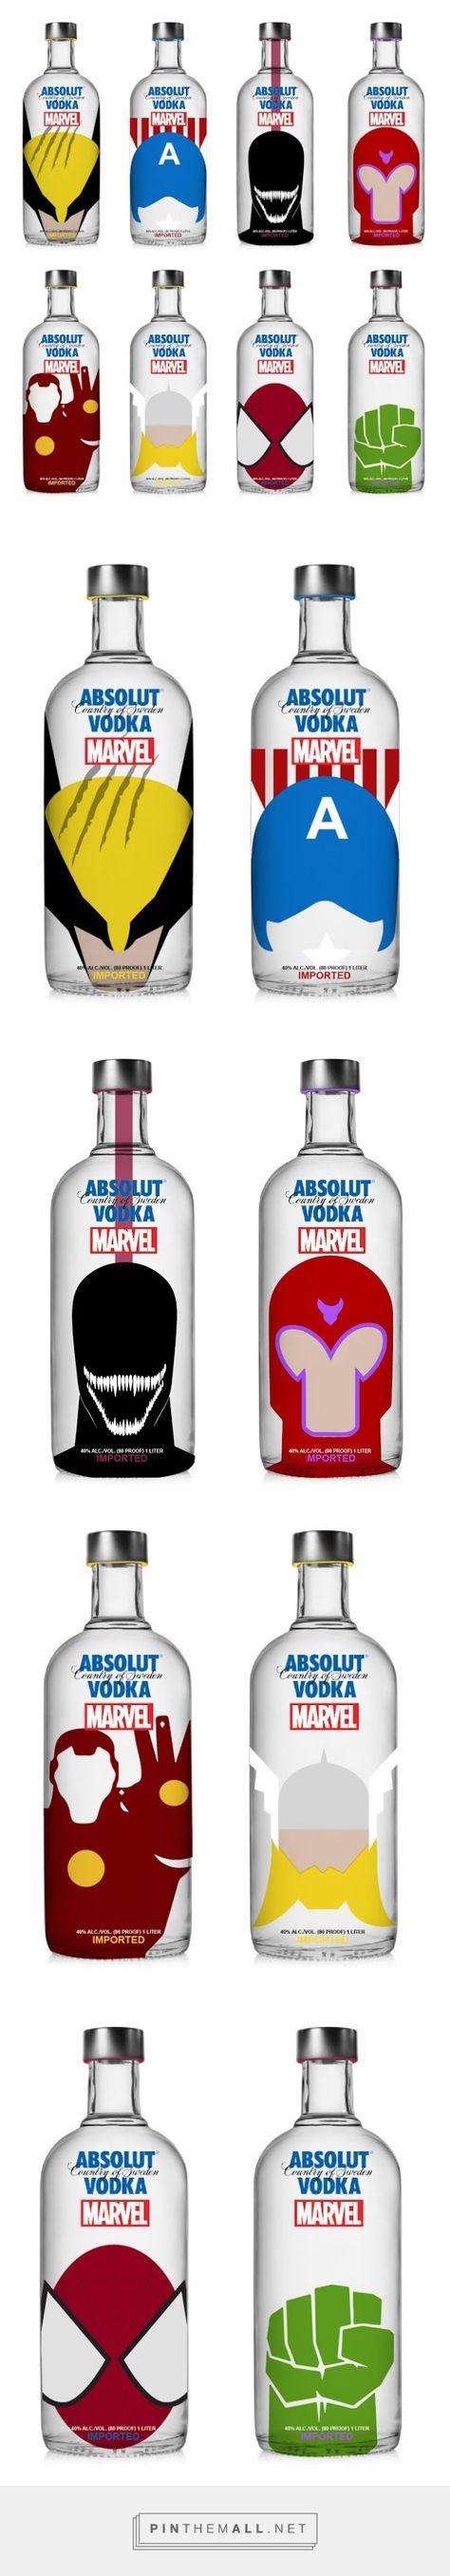 Absolut Vodka x Marvel Concept designed by Krizia Soetaniman - http://www.packagingoftheworld.com/2015/11/absolut-vodka-x-marvel-concept.html